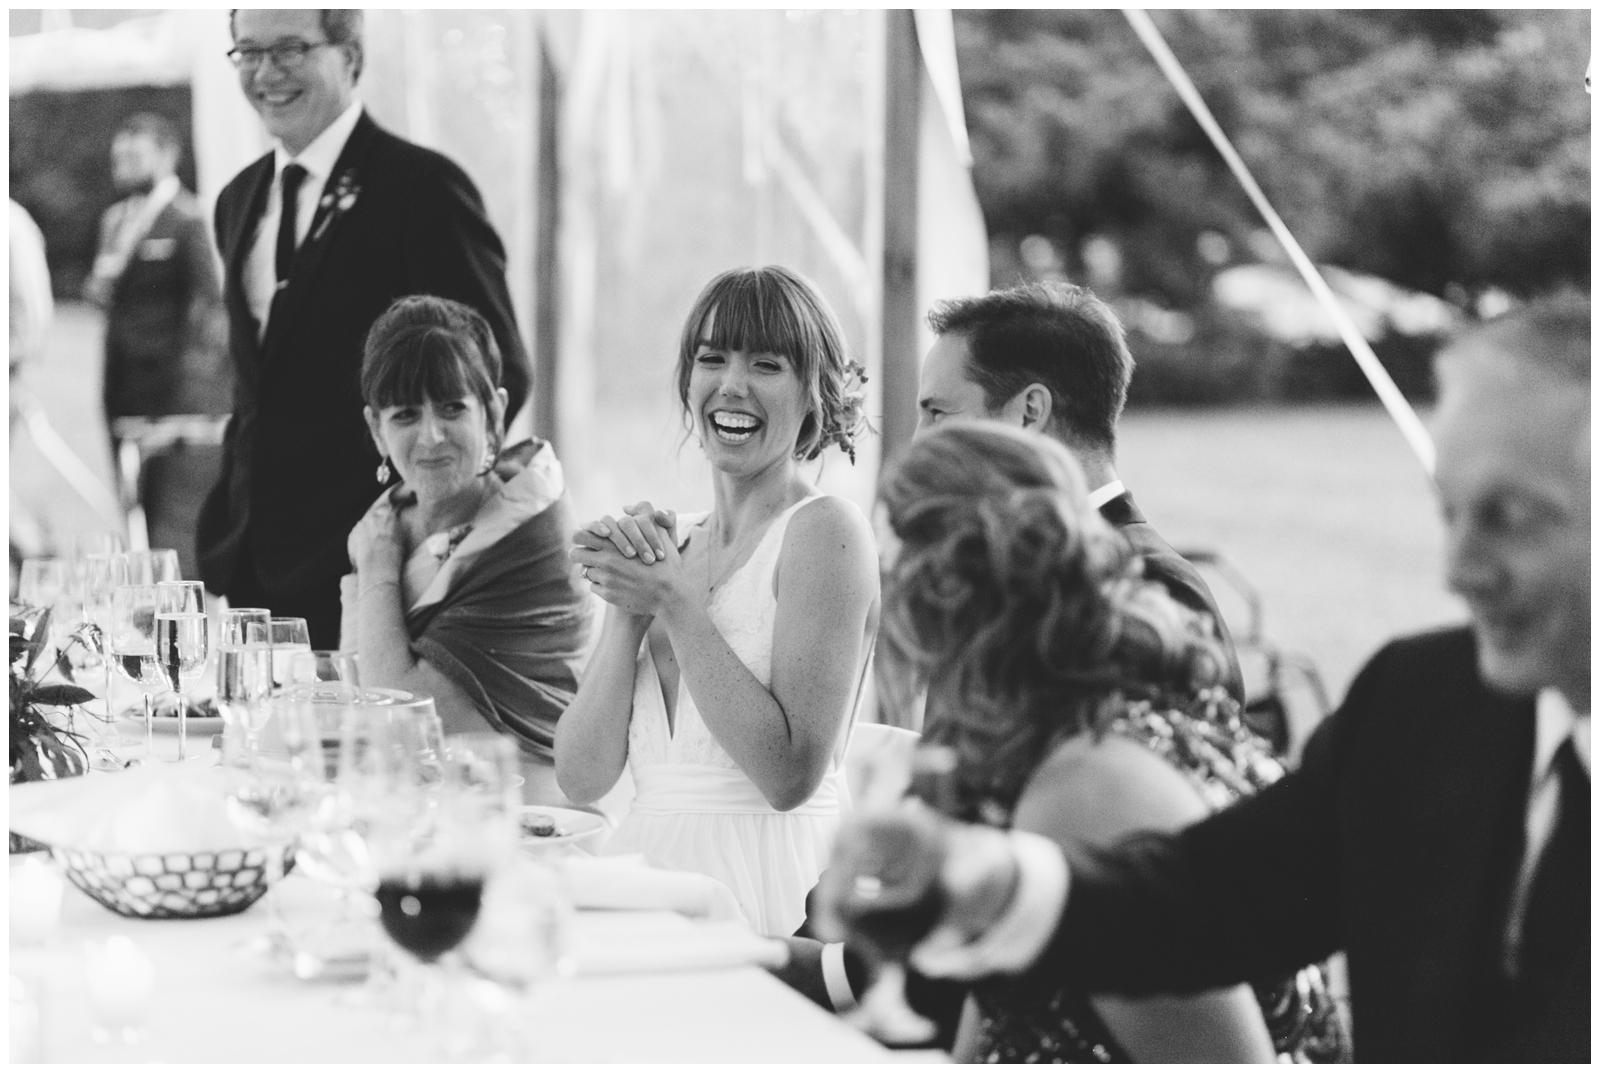 Moraine-Farm-wedding-Bailey-Q-Photo-Massachusetts-wedding-photpgrapher-134.jpg